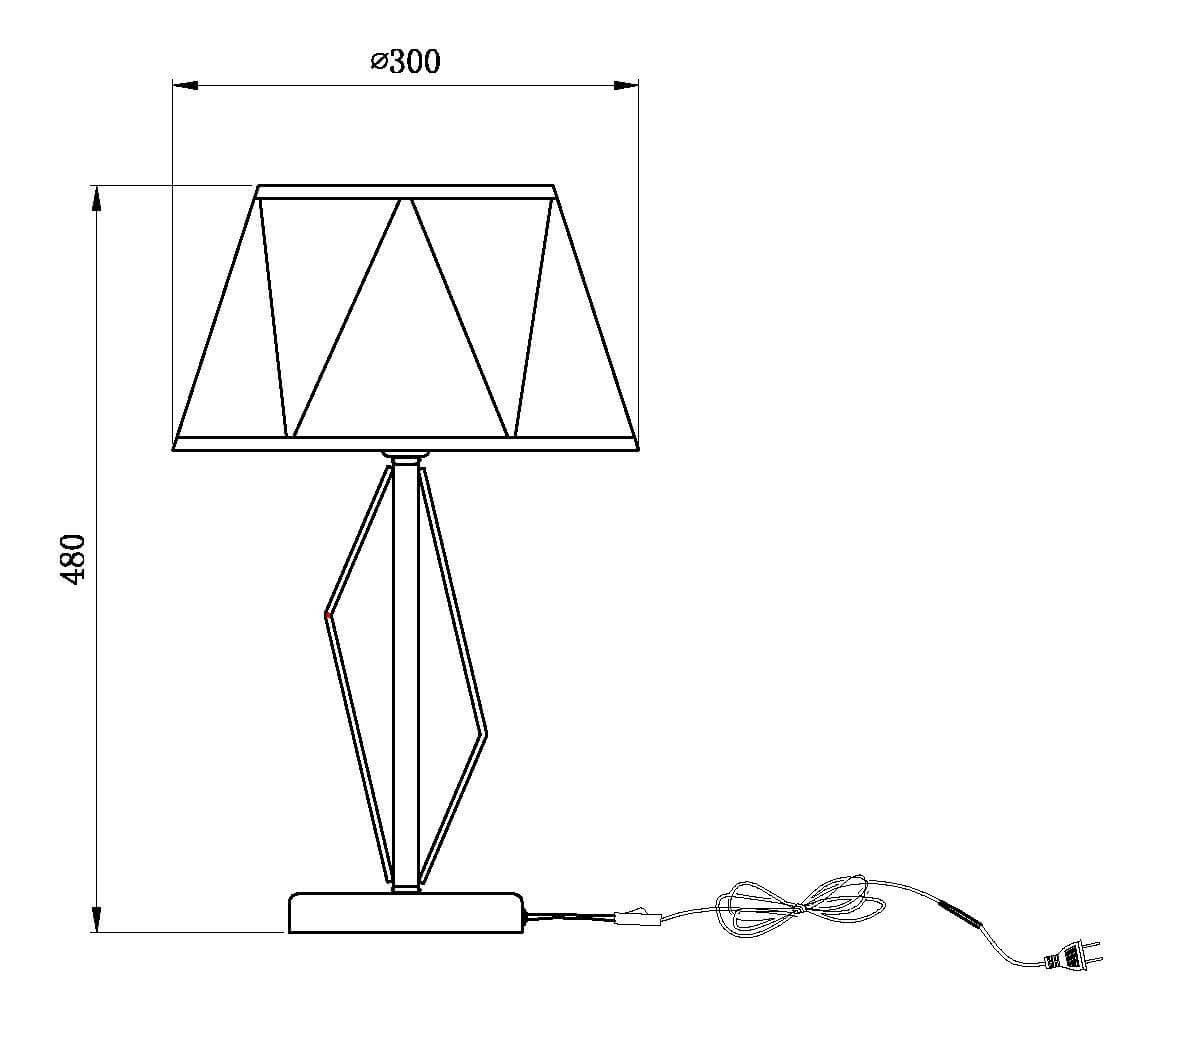 Настольная лампа Vele Luce Si VL2191N01 настольная лампа декоративная vele luce toppi vl1841n01